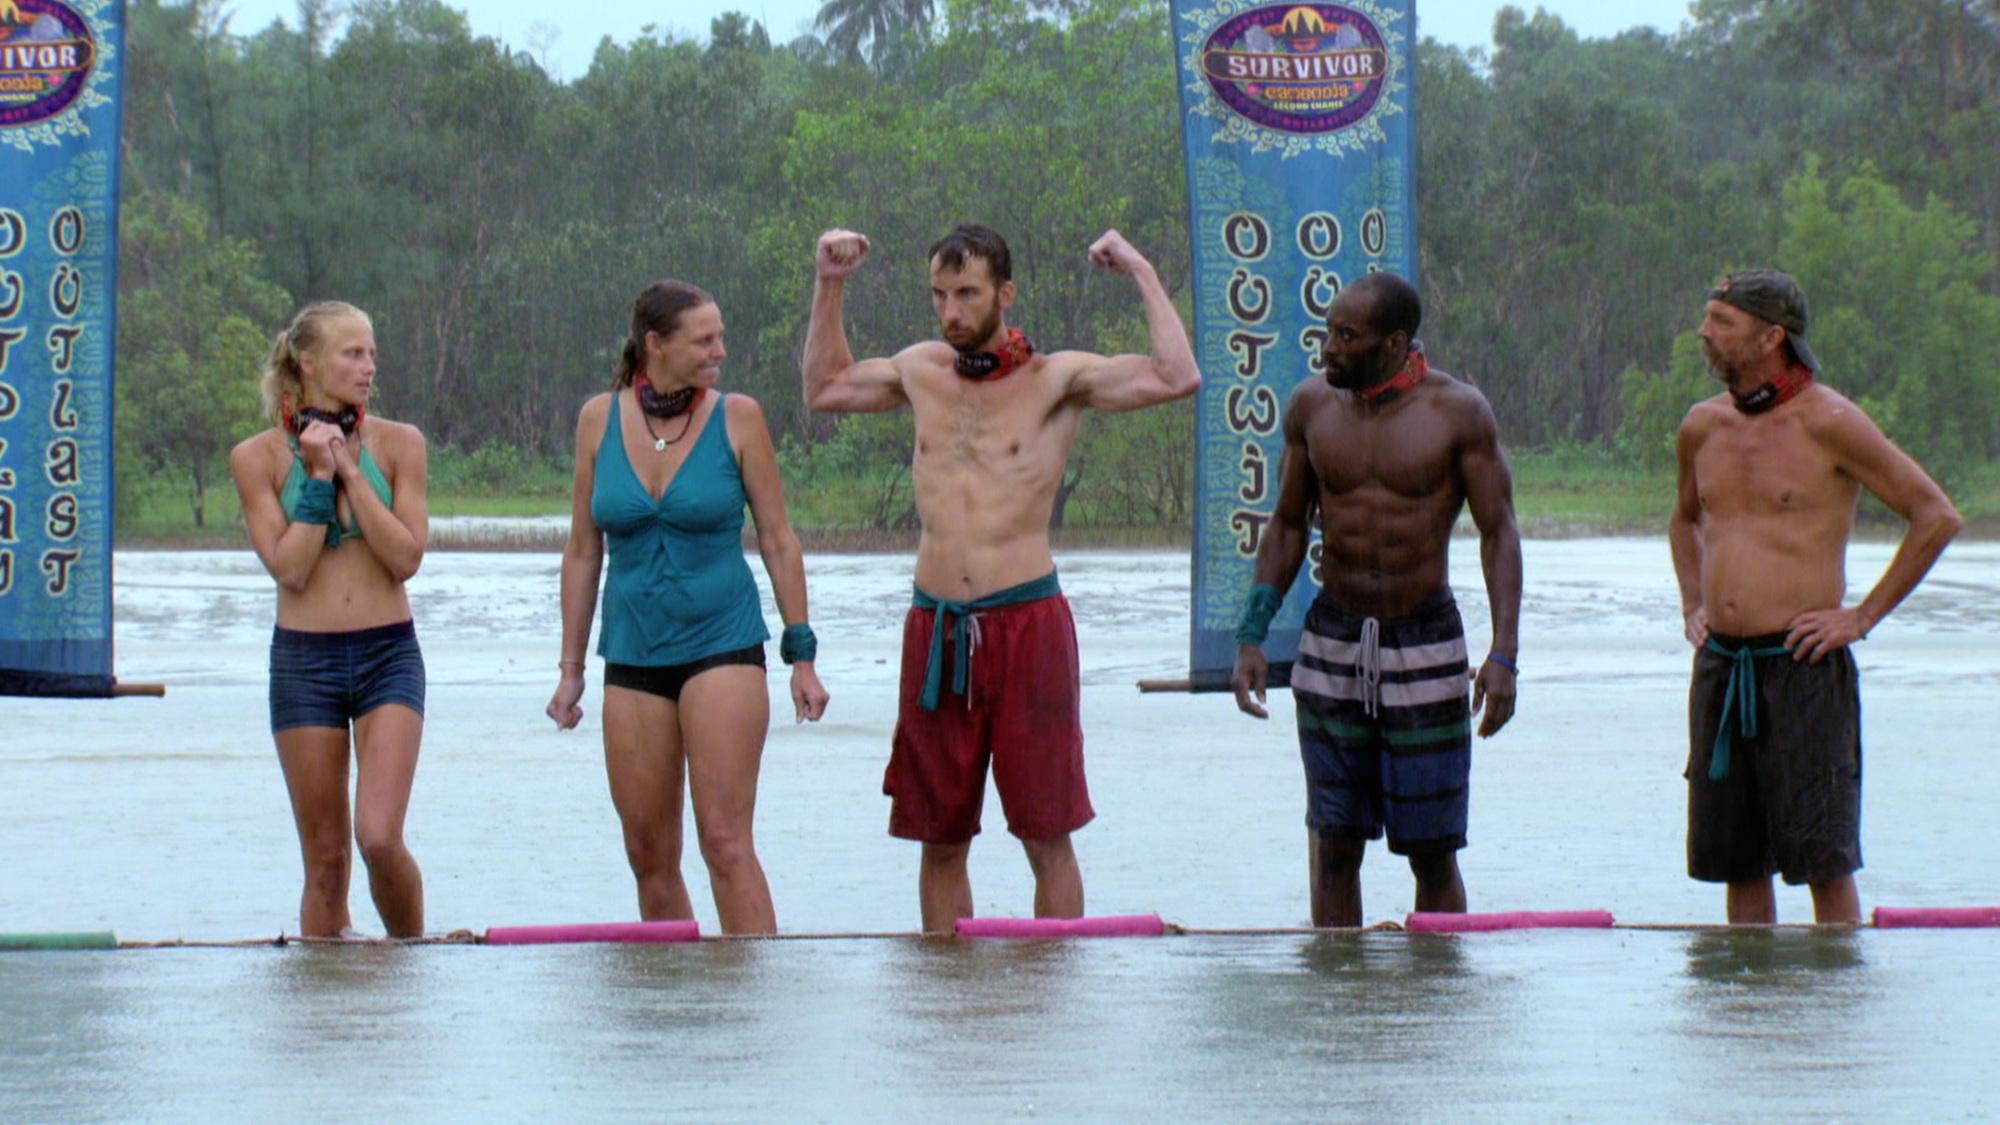 Stephen Fishbach flexes before challenge on Survivor: Second Chance